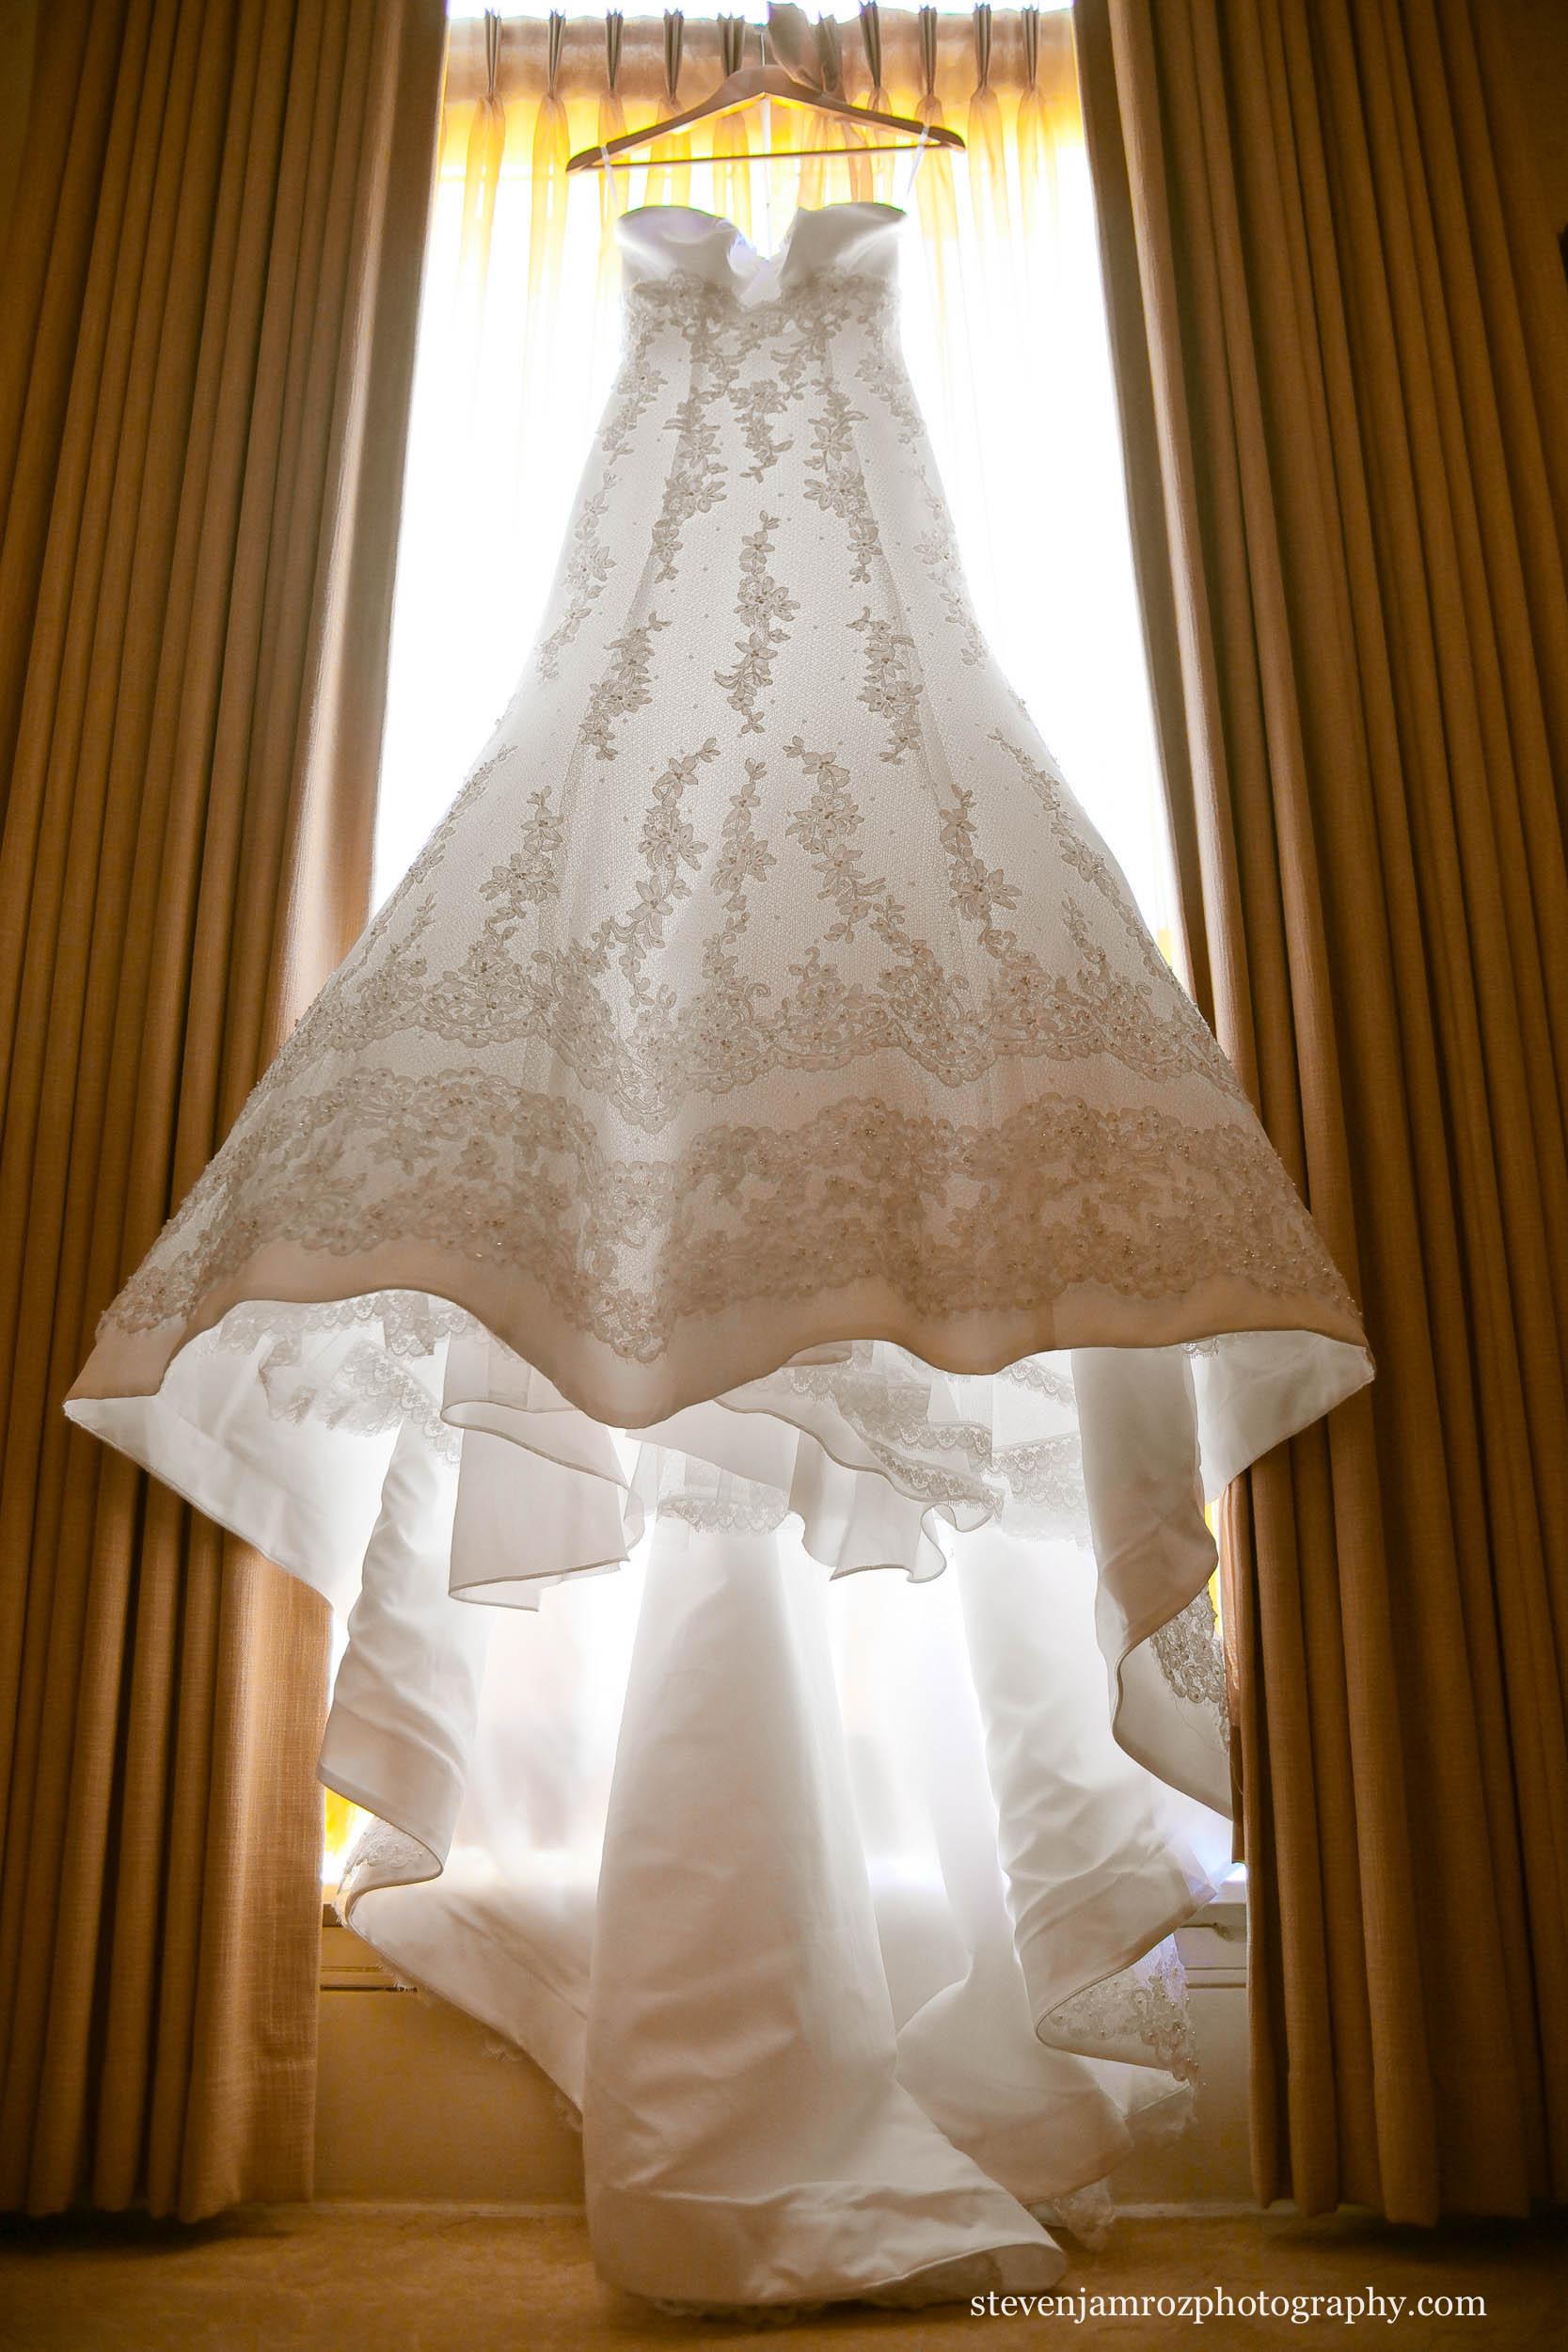 hanging-wedding-dress-raleigh-nc-wedding-steven-jamroz-photography-0470.jpg